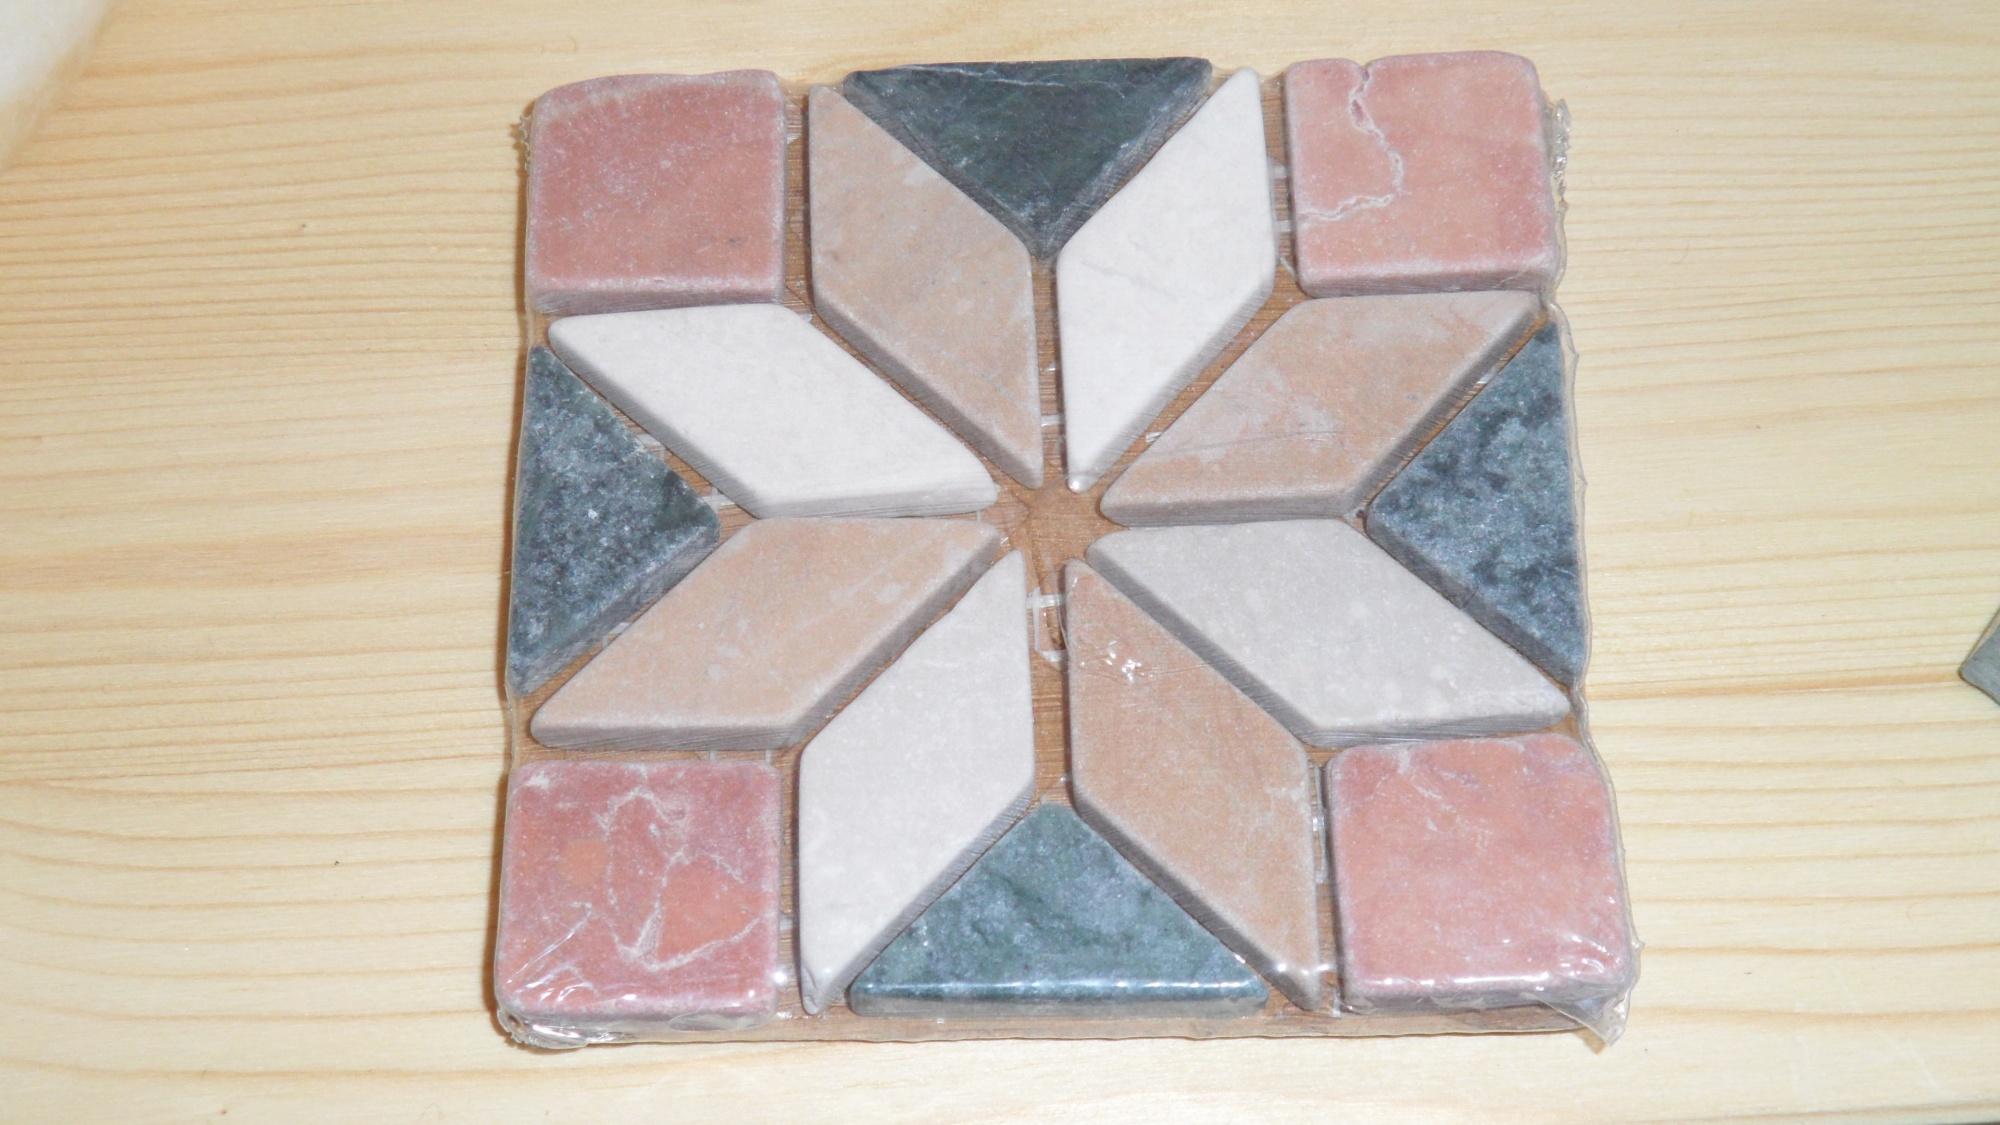 Inserti decorazioni in marmo per cucina in muratura